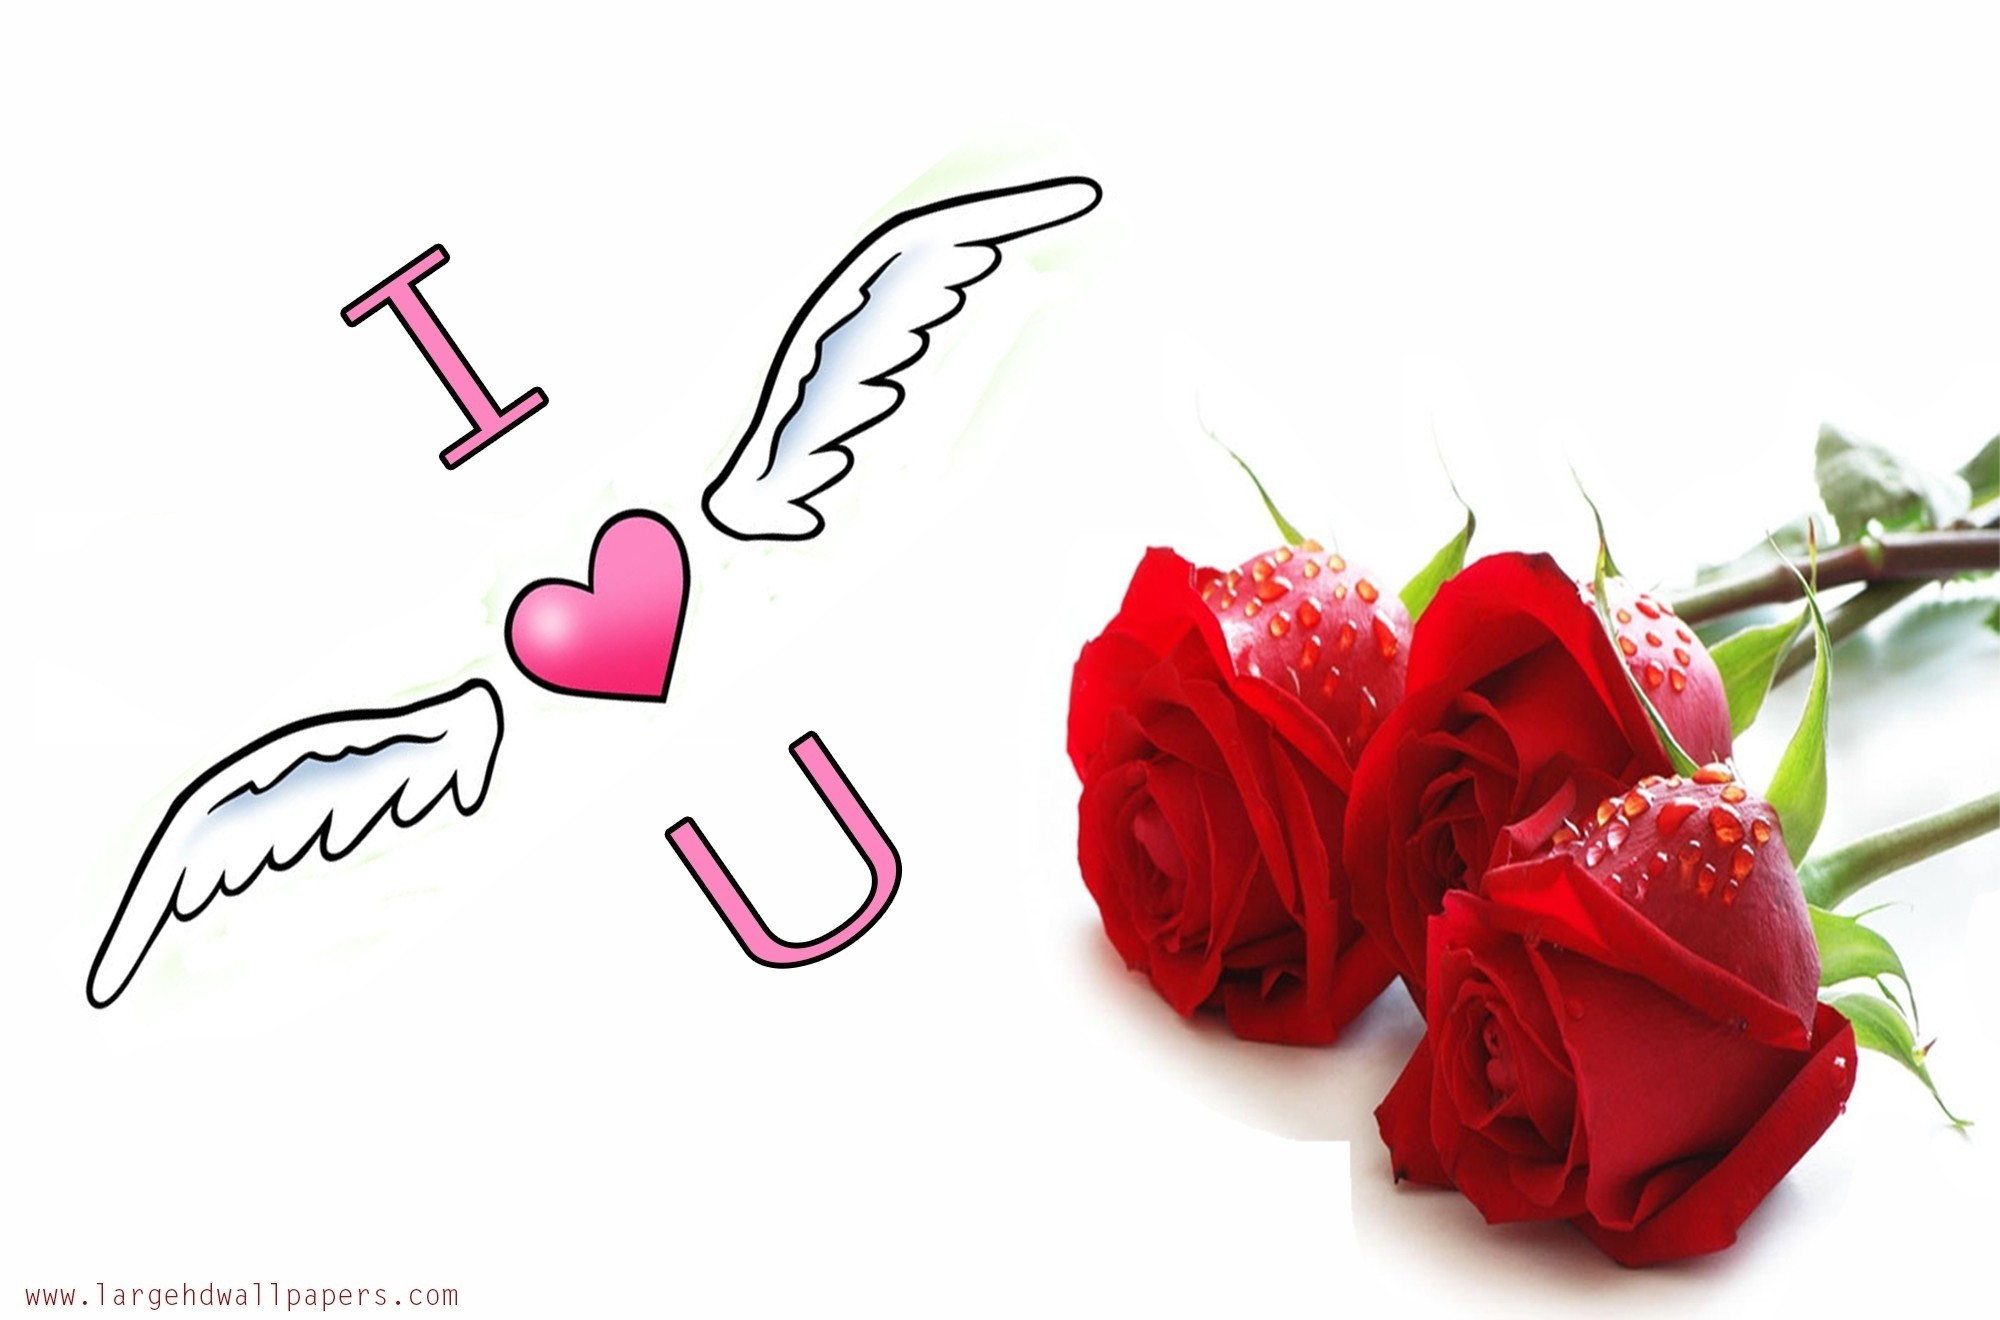 Red Rose Wallpaper I Love U Hd Wallpaper I Love You - Love You Rose Photo Hd - HD Wallpaper